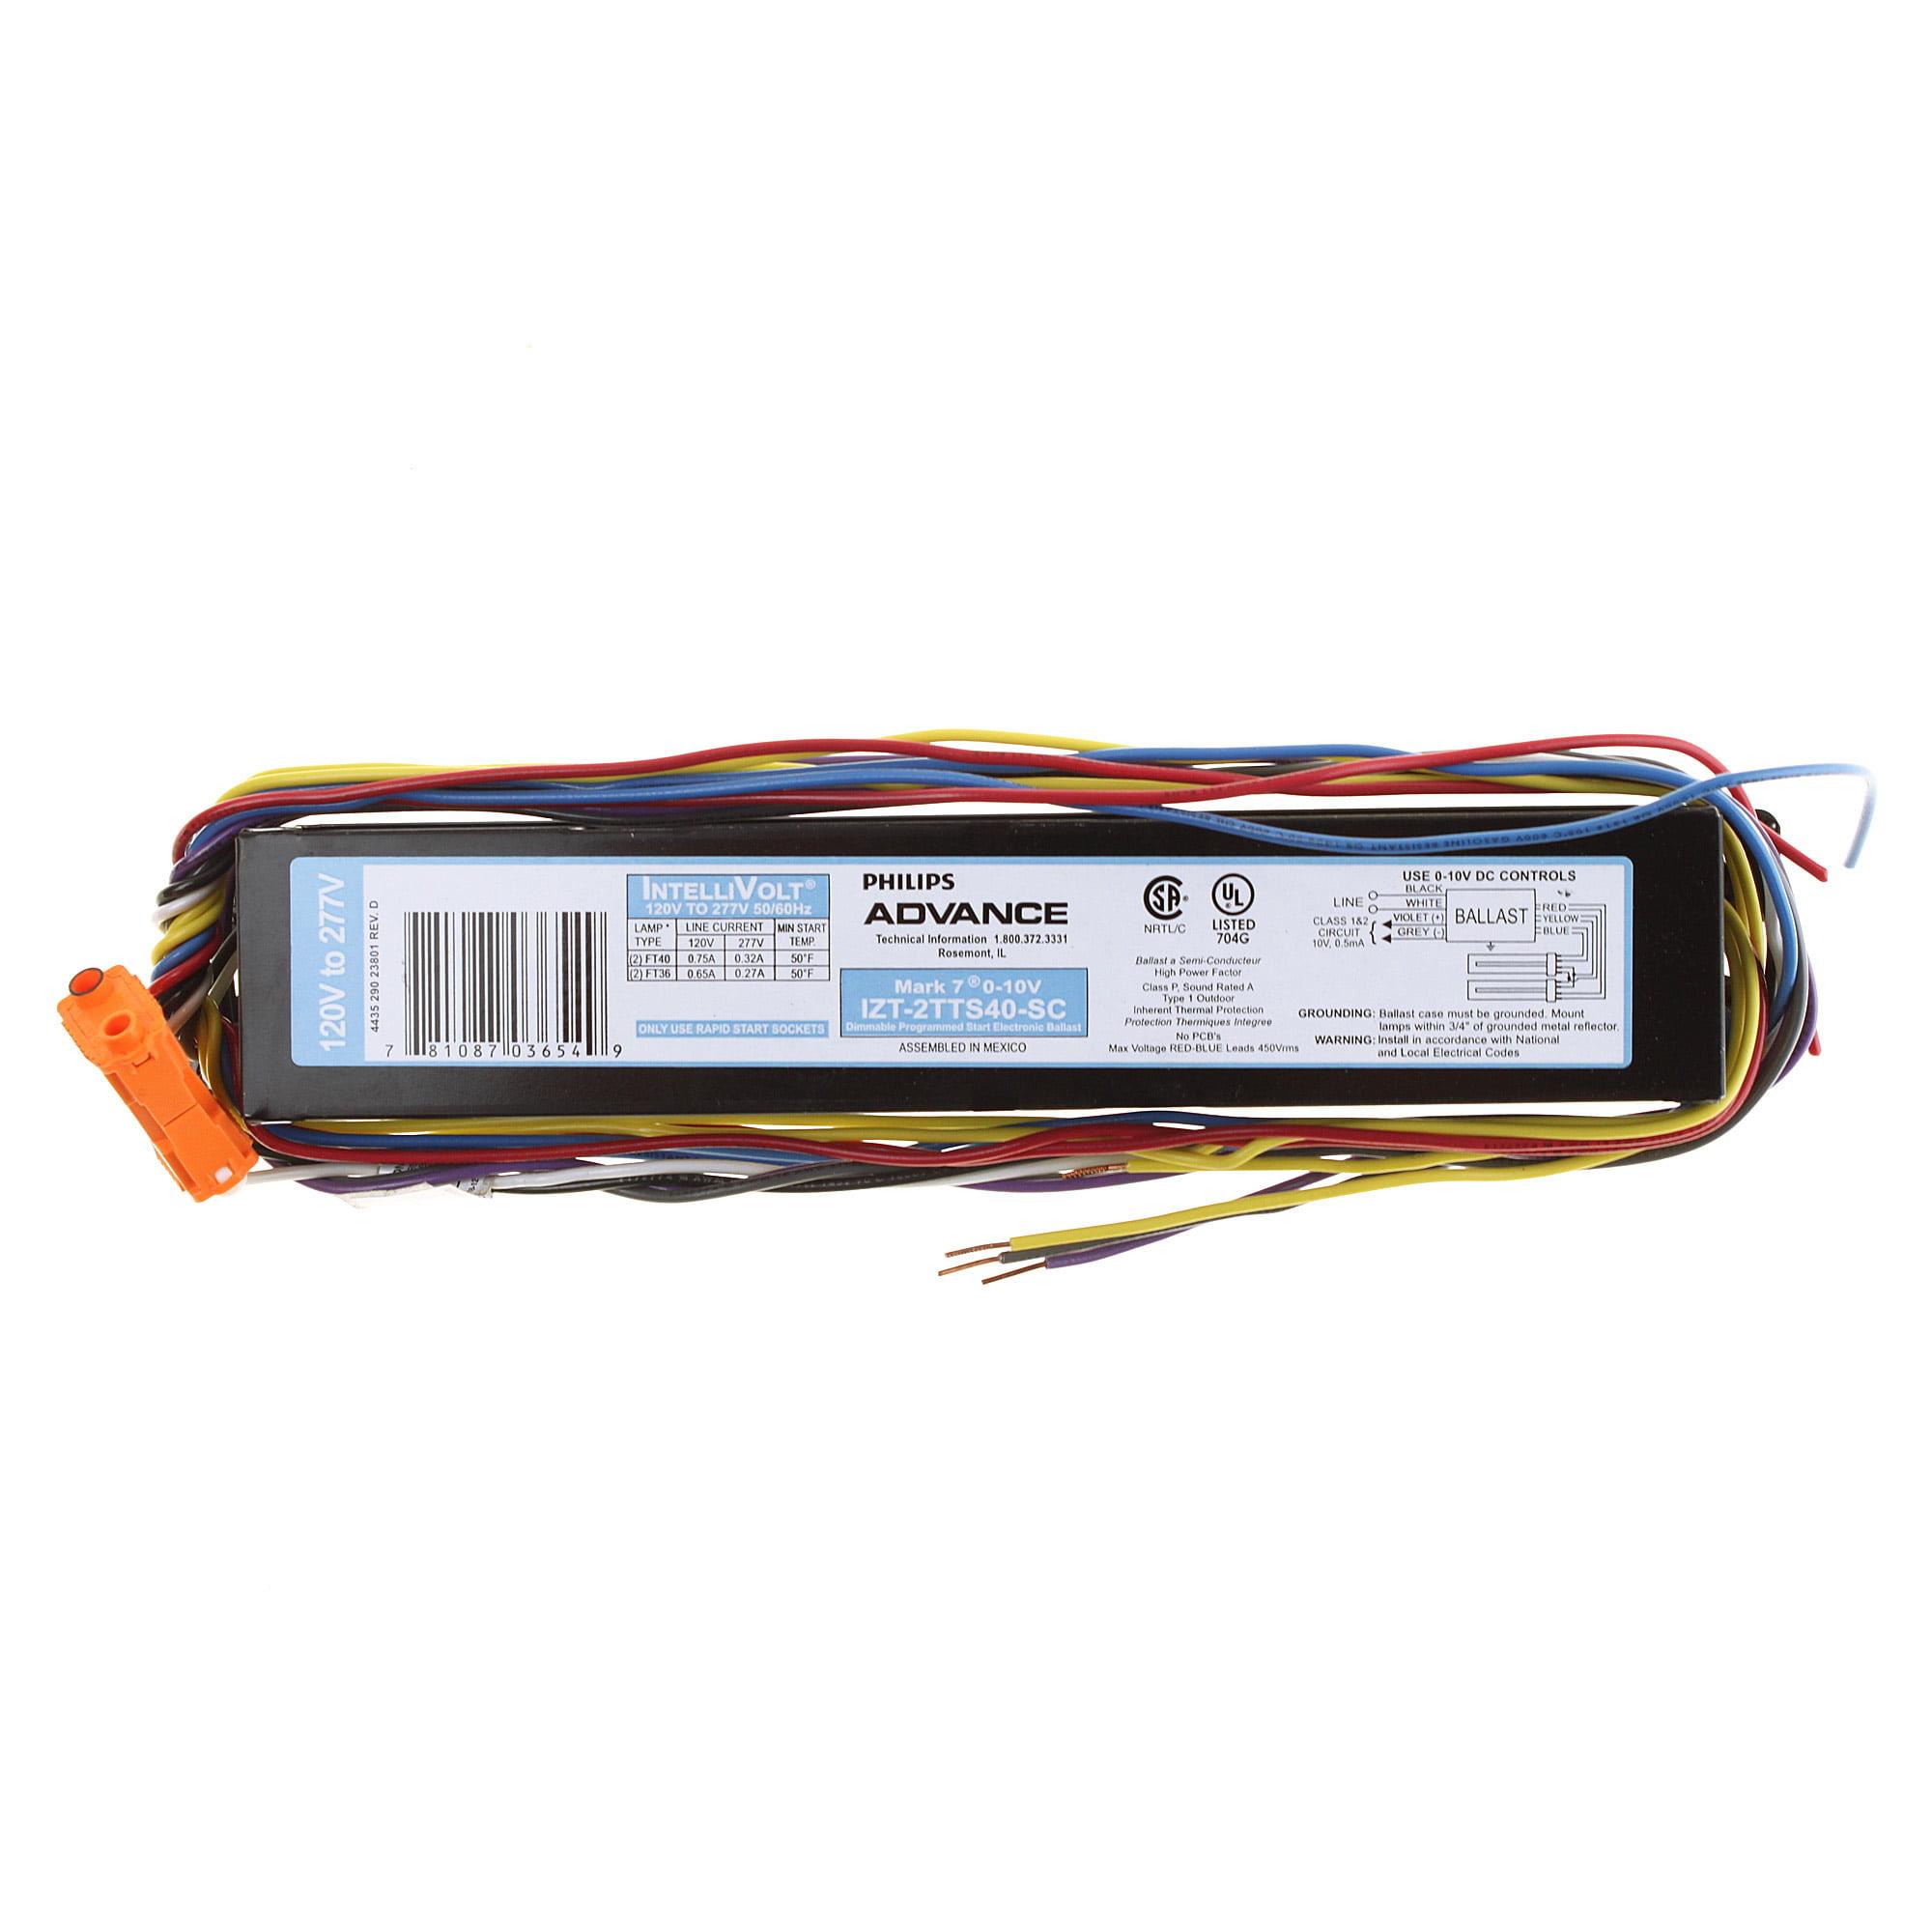 Philips Advance IZT-2TTS40-SC MARK 7 Electronic Fluorescent Ballast, 0-10V, 40W